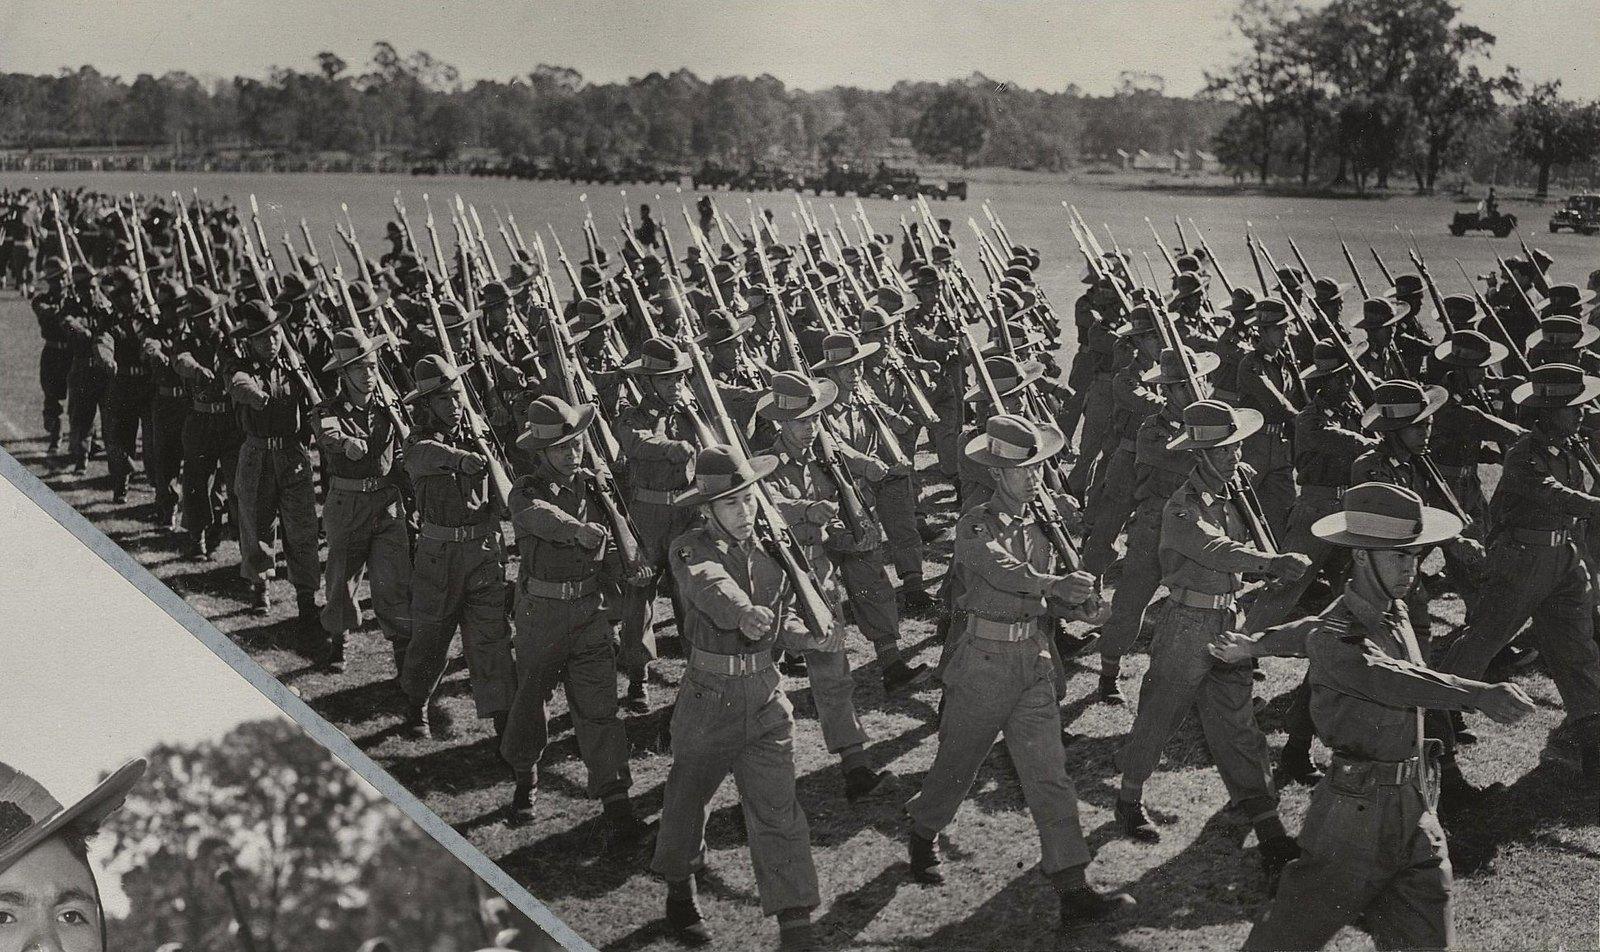 29. Парад войск в Маймьо. Колонна бирманских солдат